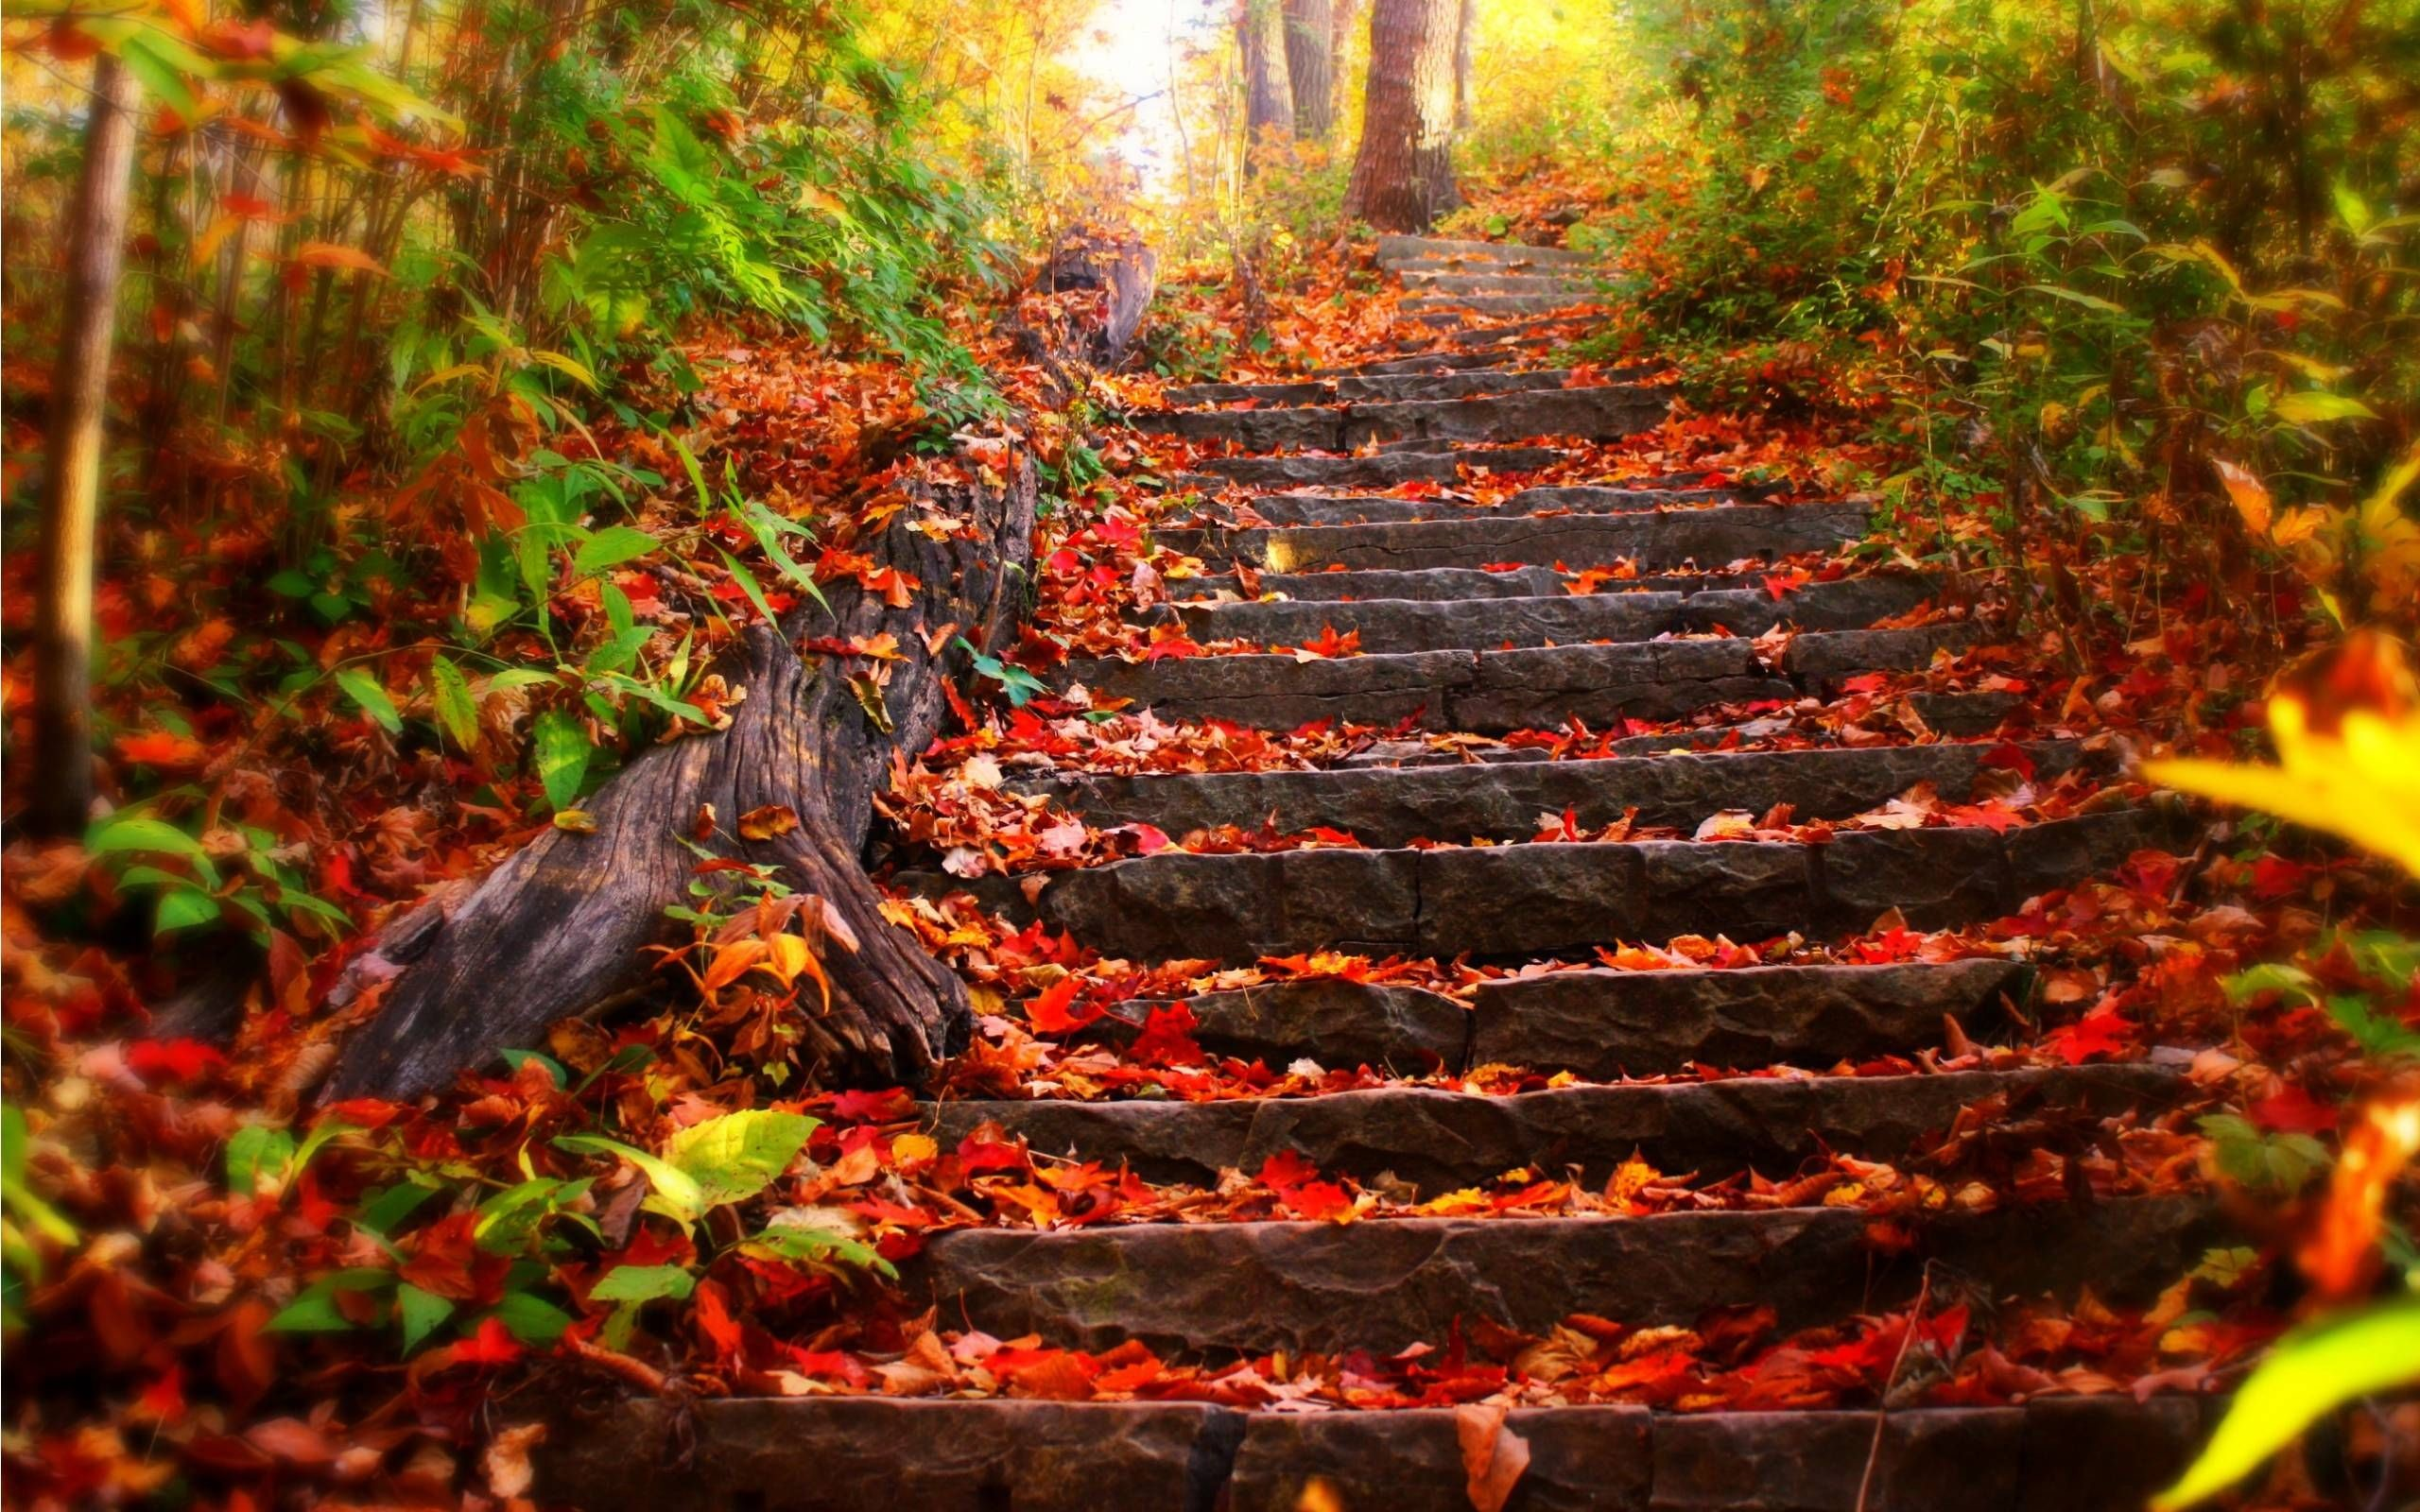 Autumn Wallpaper Backgrounds 60 images 2560x1600